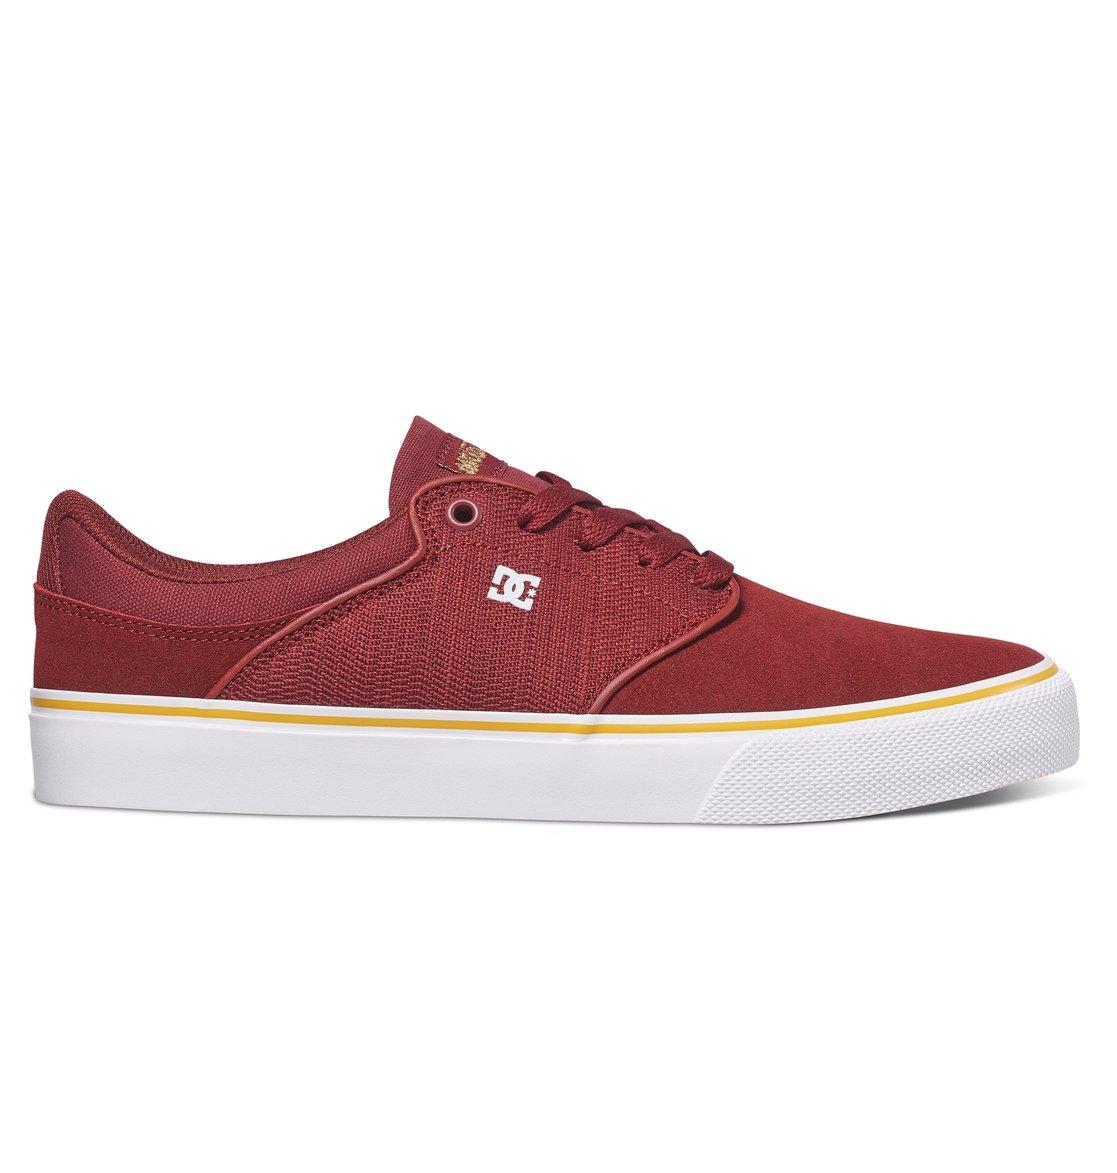 Mens Dc Mikey Taylor Vulc Sneakers Burgundy UTP76622